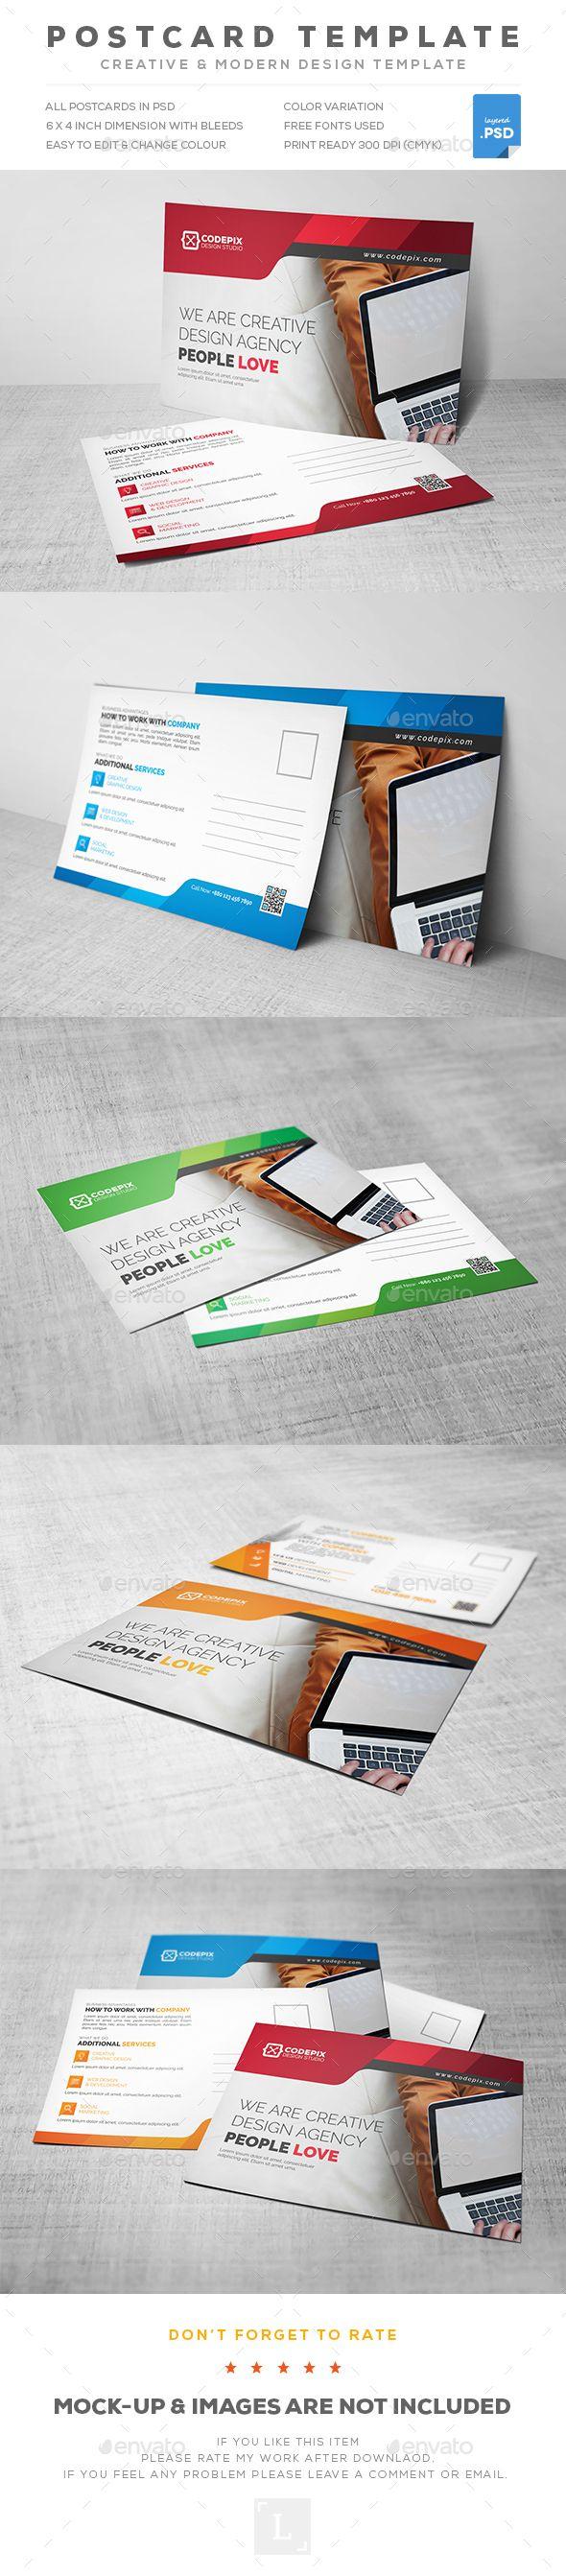 Create free postcards to print